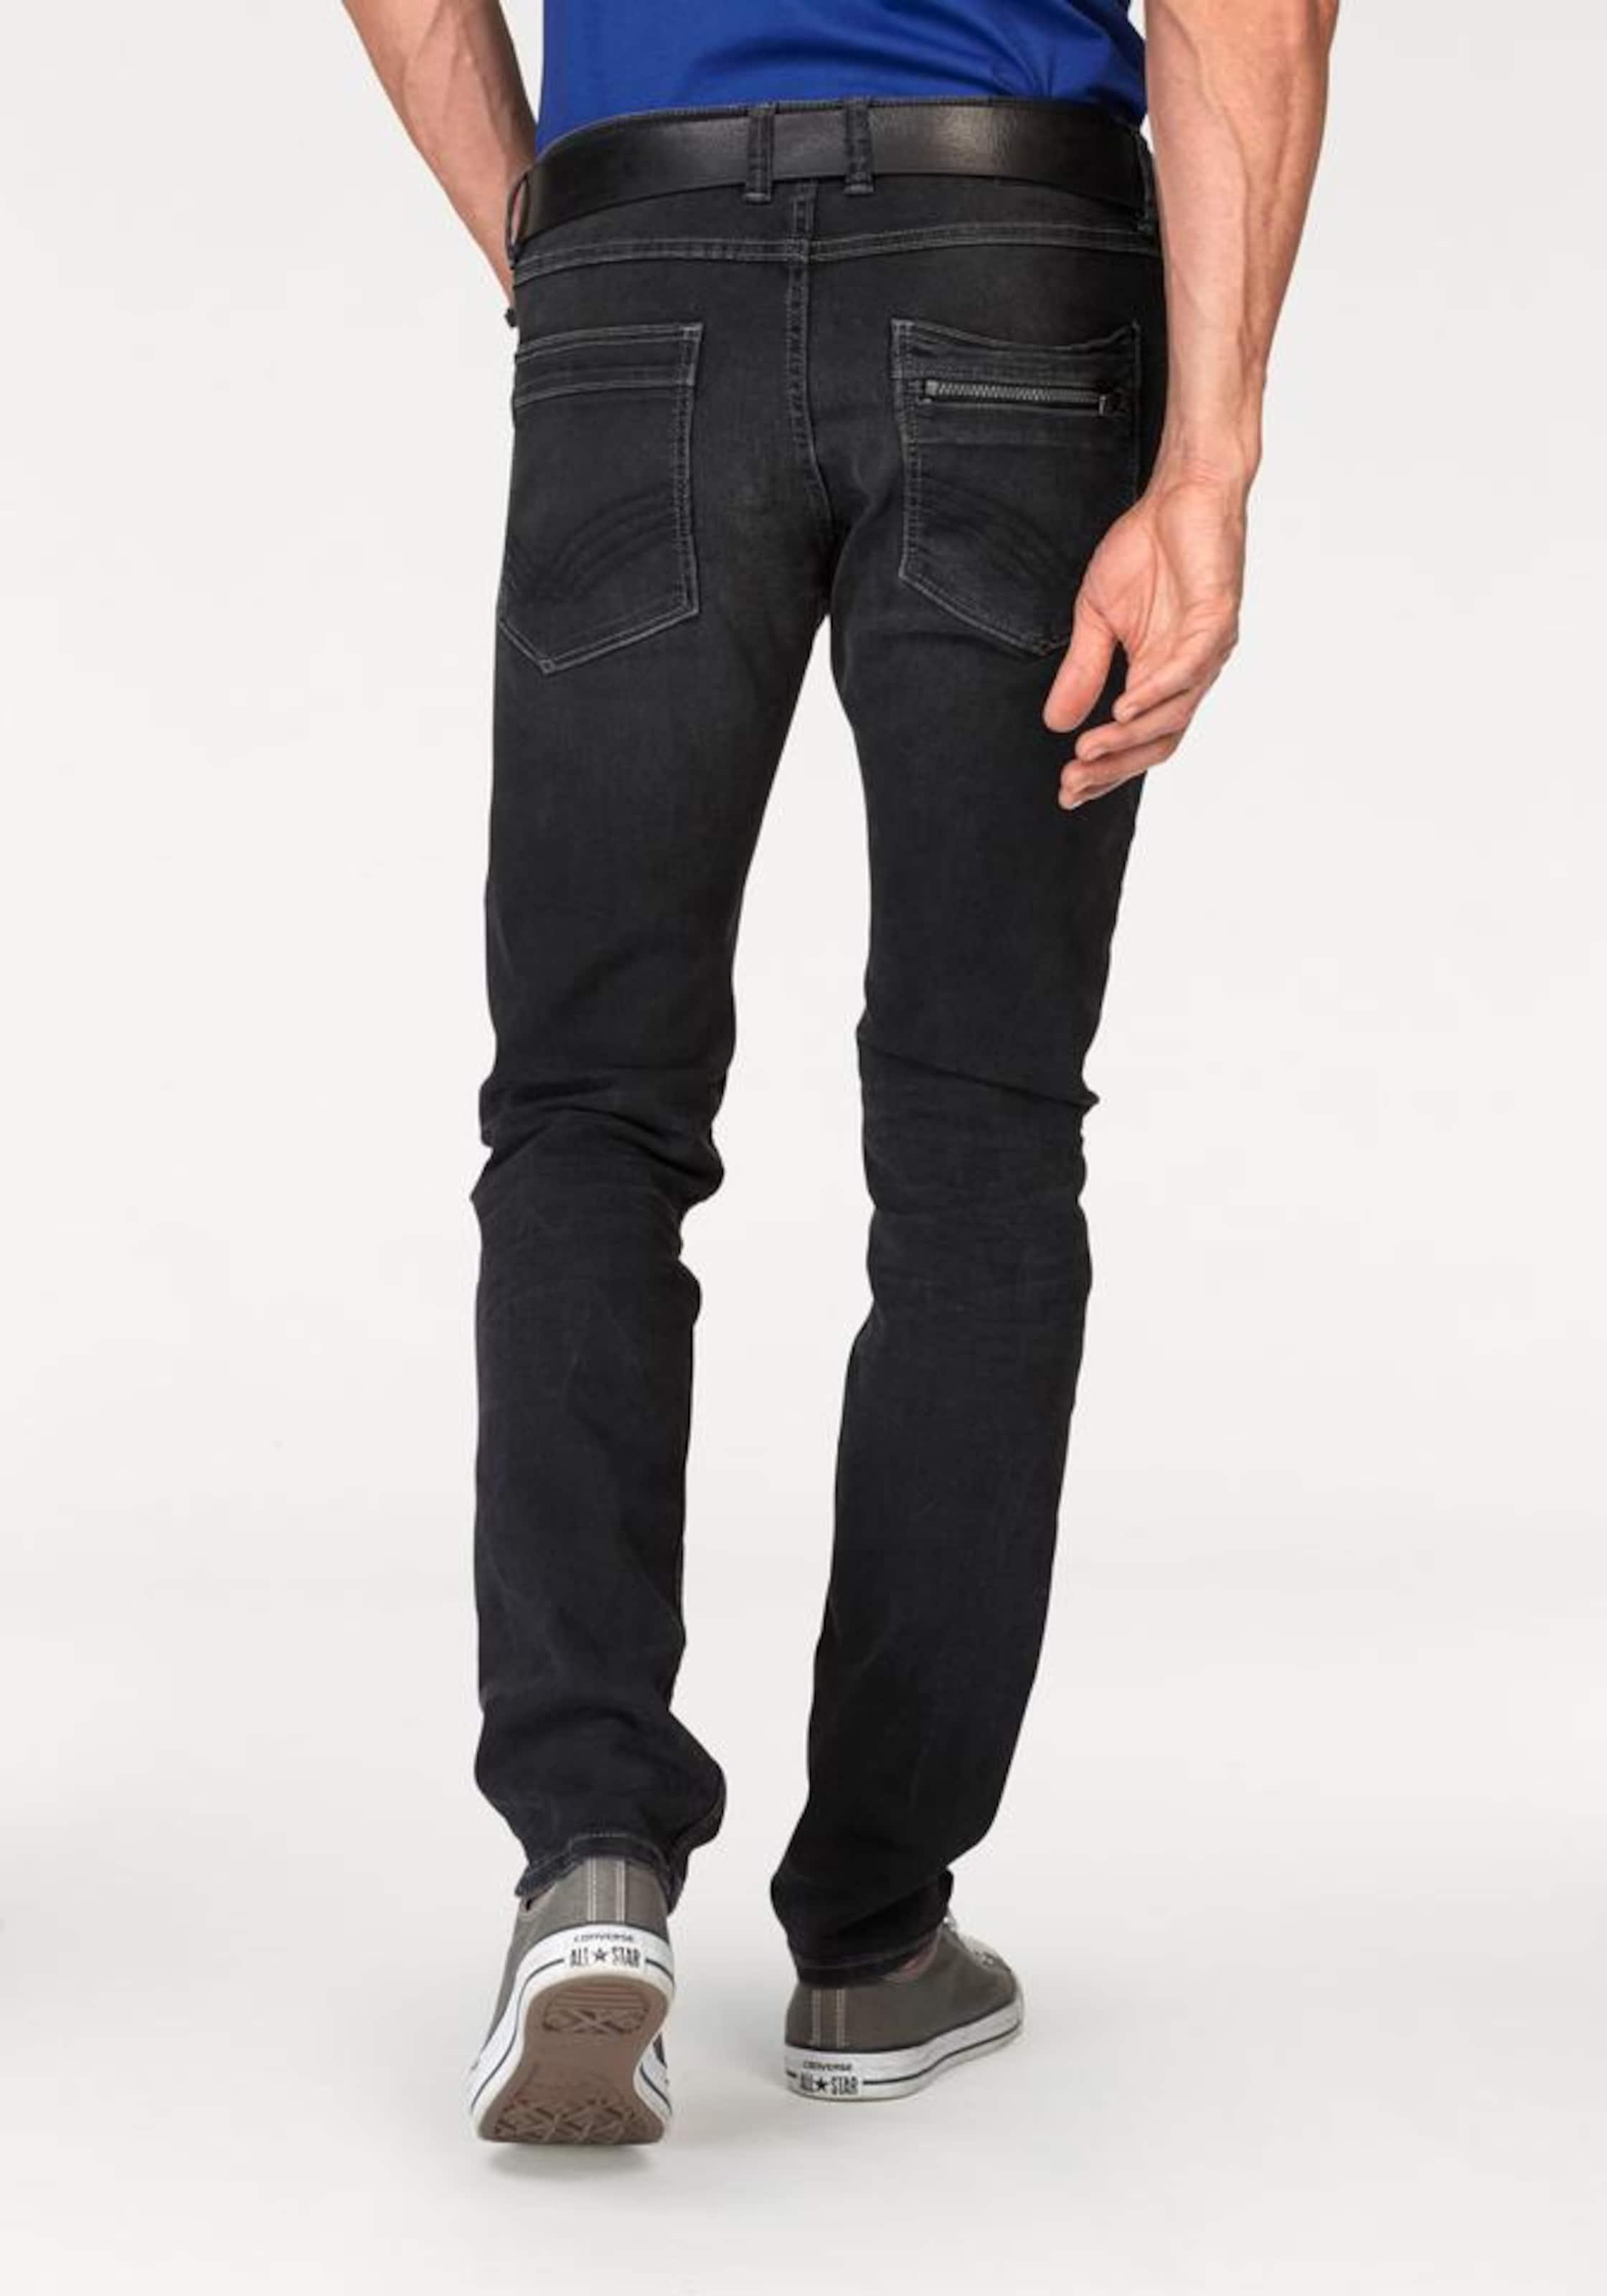 TOM TAILOR Slim-fit-Jeans 'Troy' Spielraum Neue Stile Billig Verkauf XvozLnr